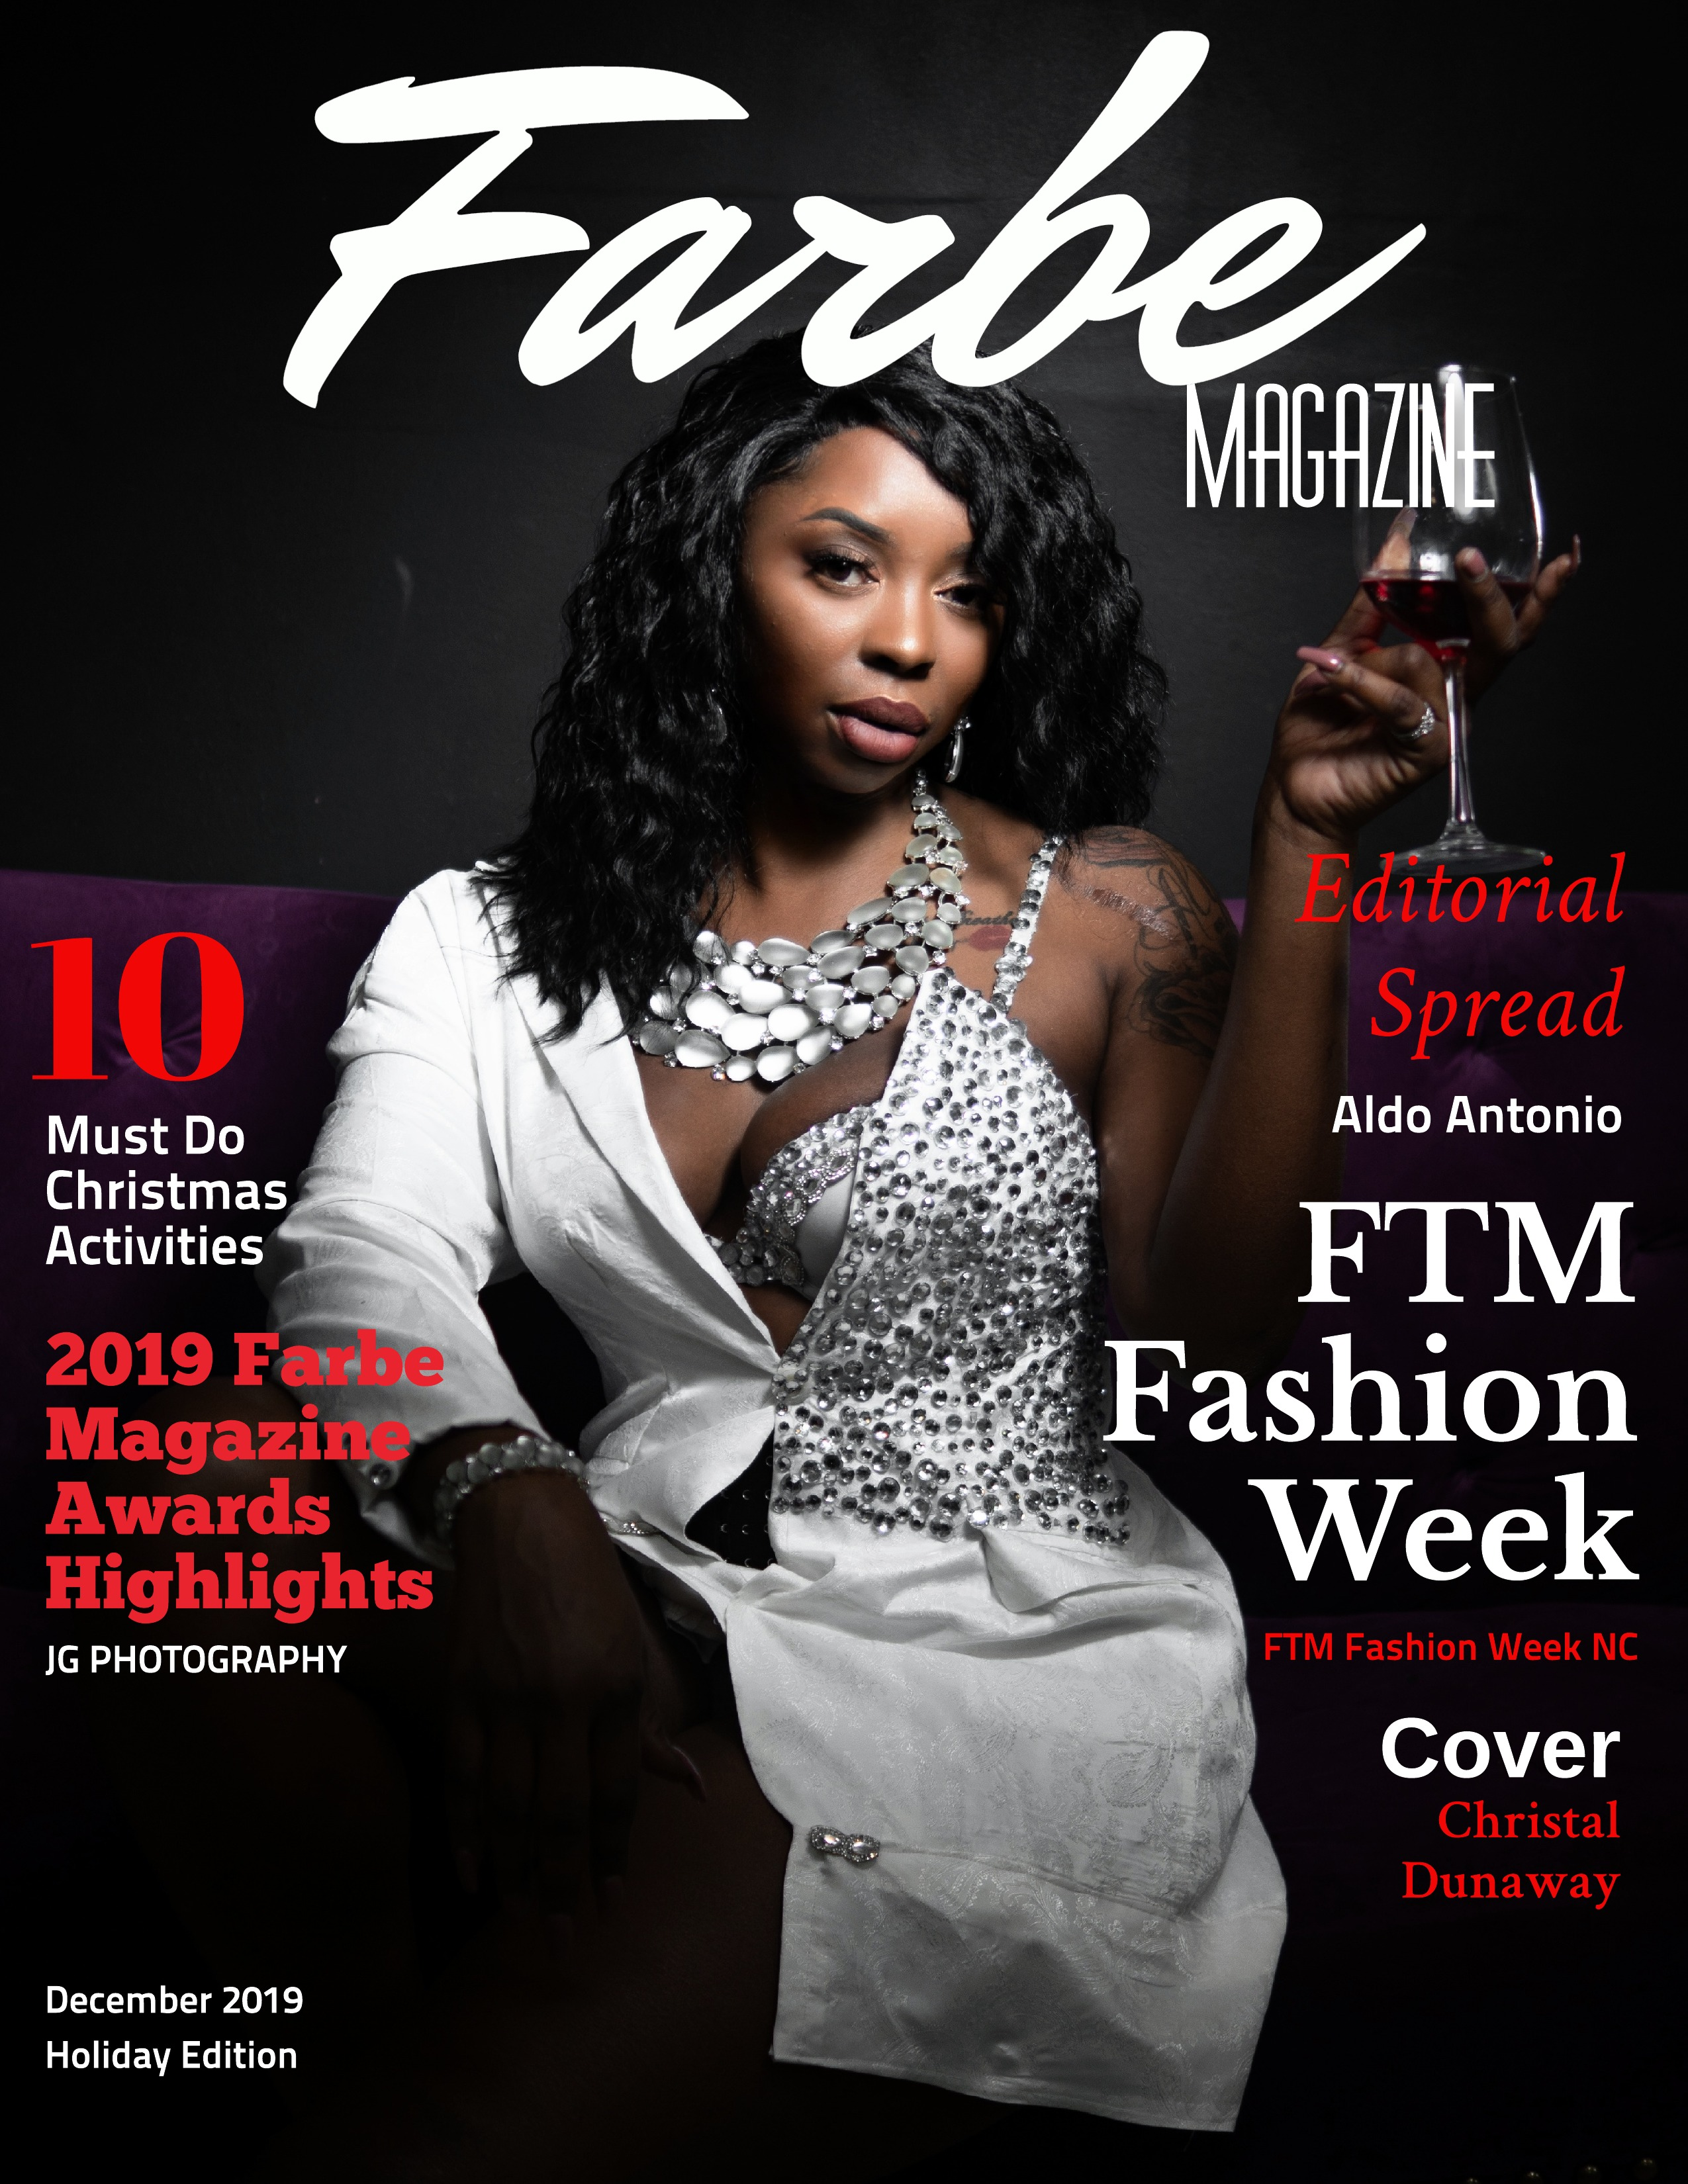 2019 December Publication